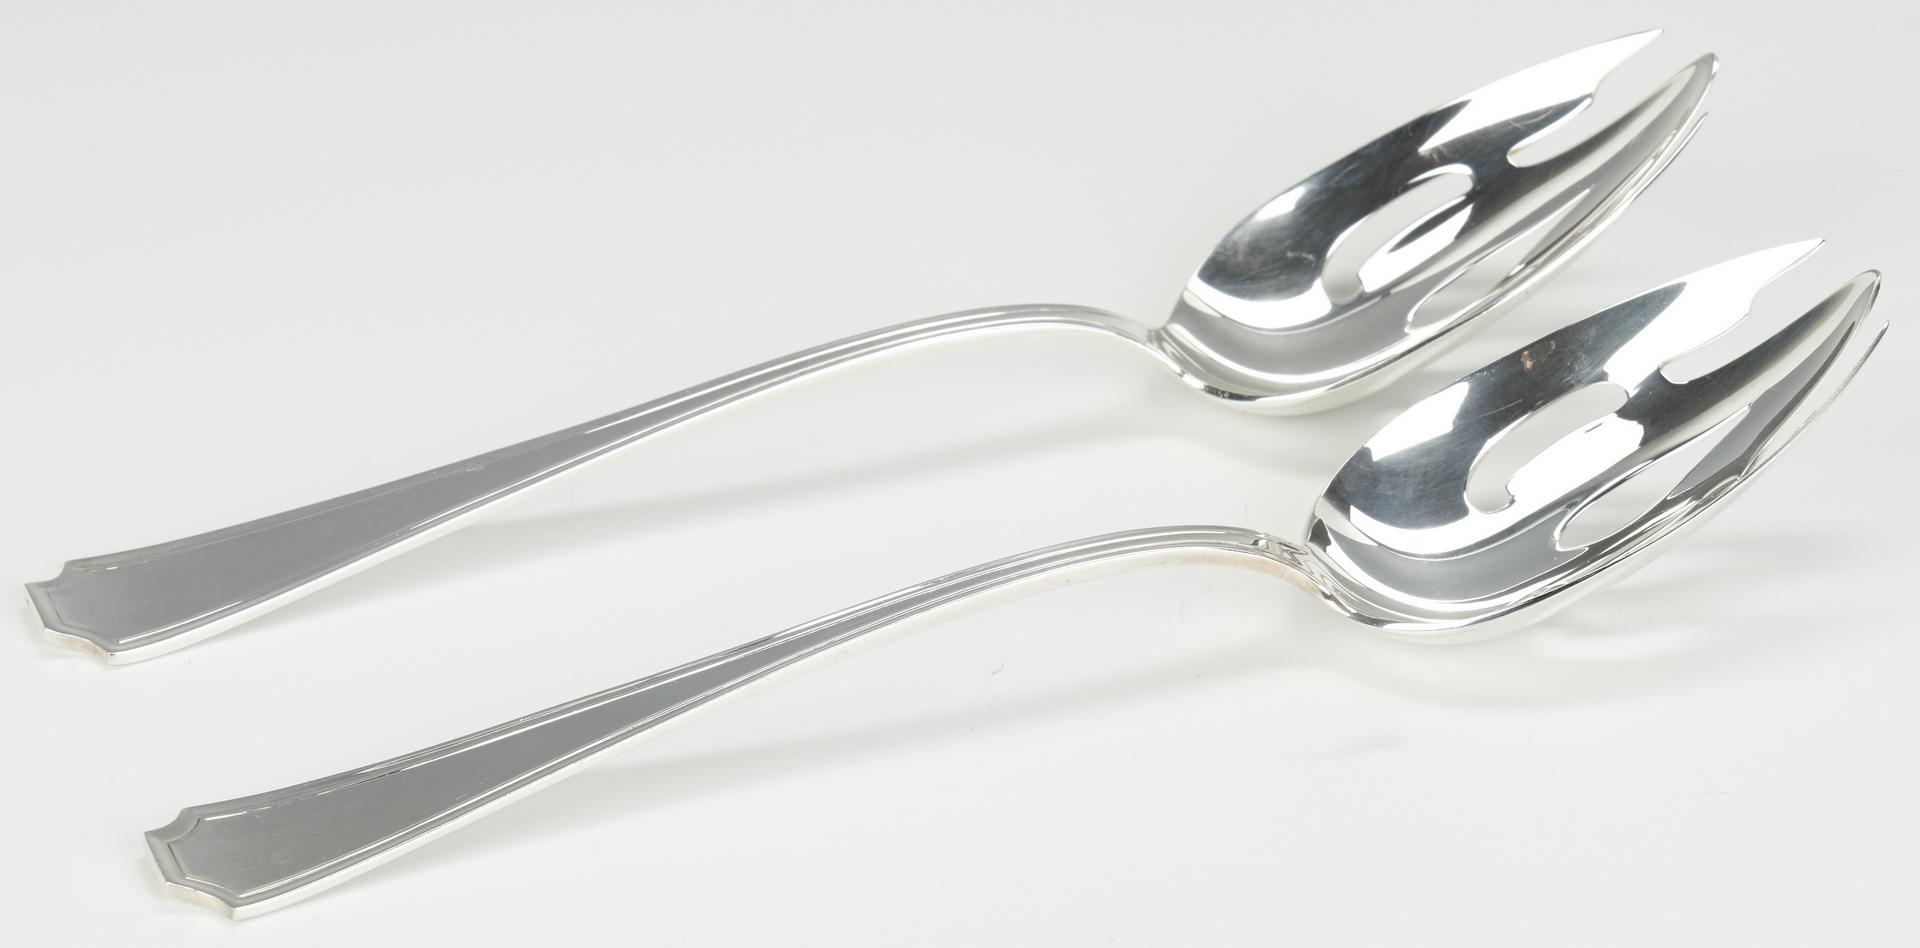 Lot 958: Tiffany Strawberry Vine Spoon and 7 Gorham Fairfax Items